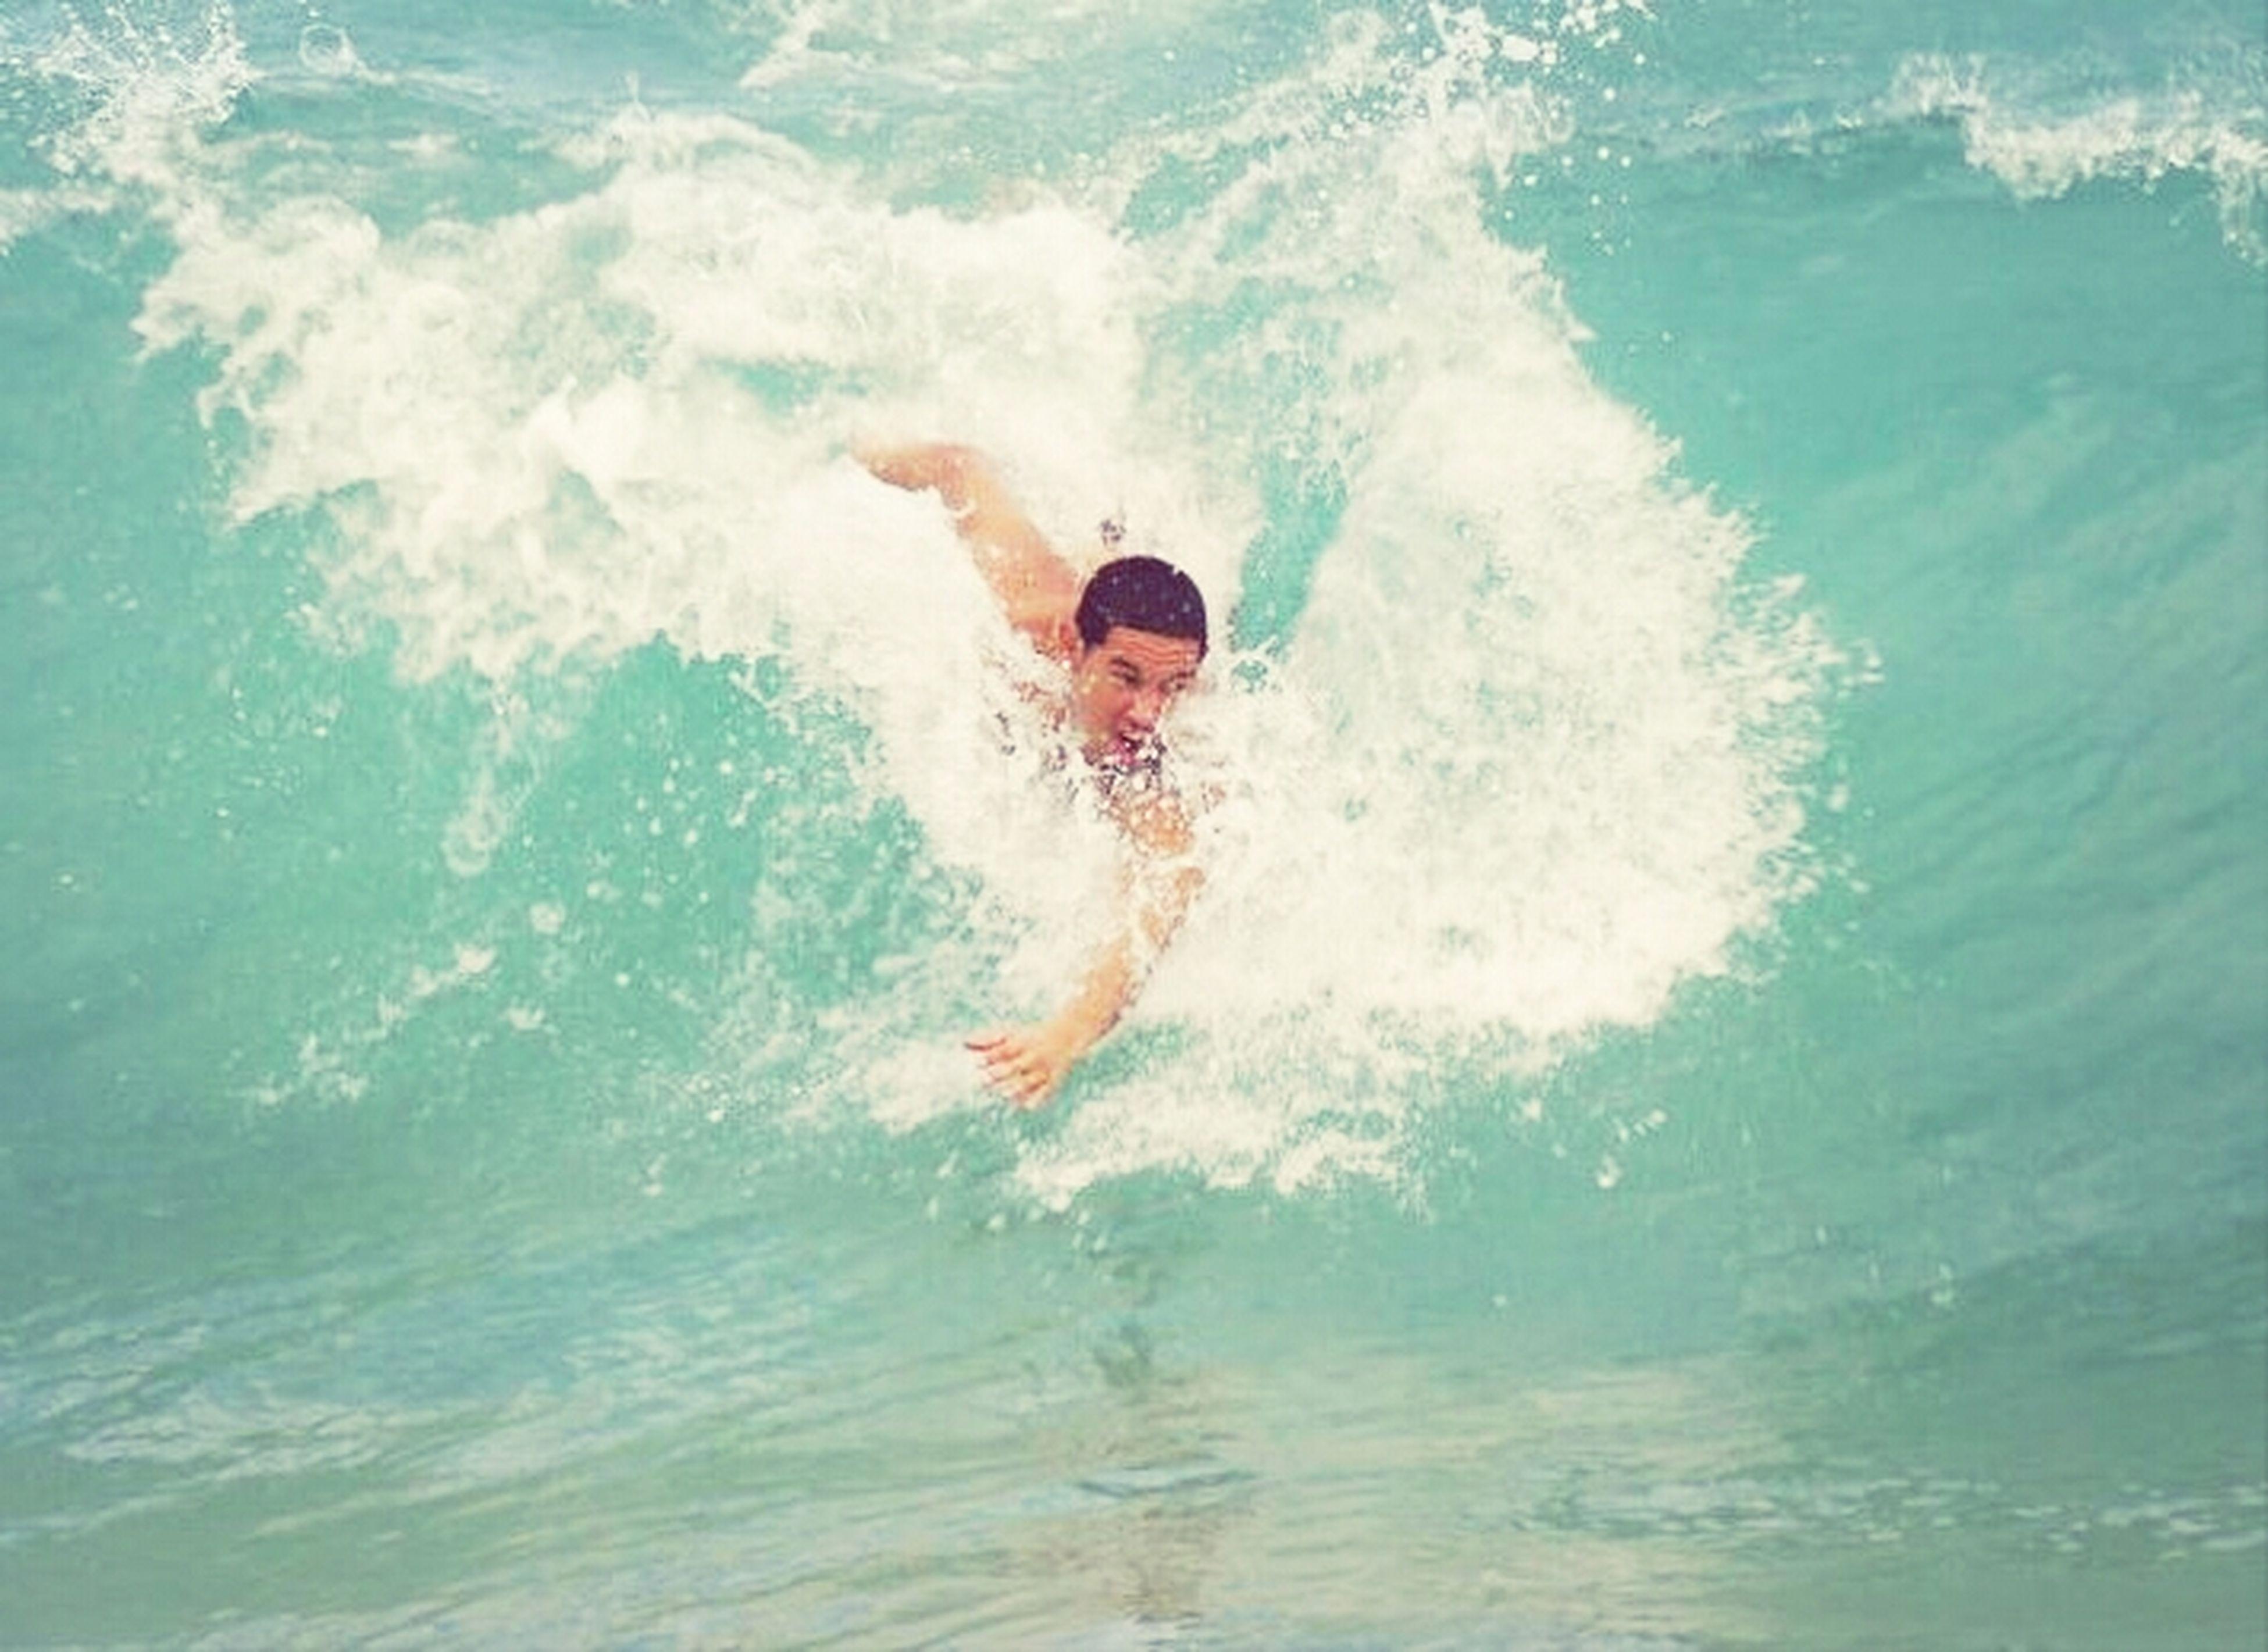 Good surf sesh